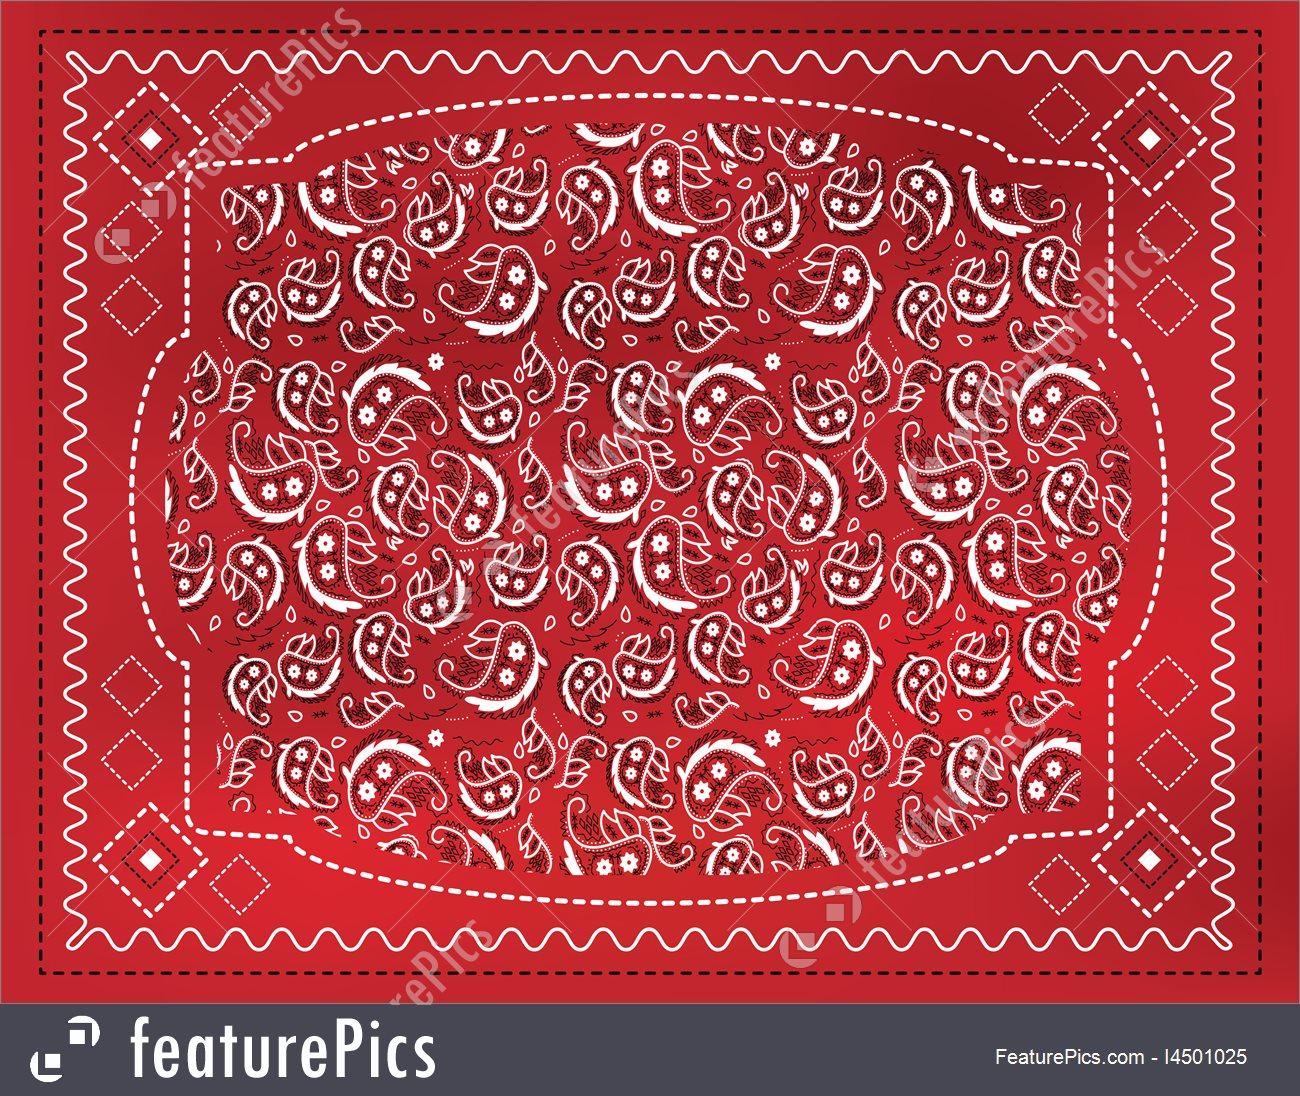 Red Paisley Handkerchief Stock Illustration I4501025 at FeaturePics 1300x1096